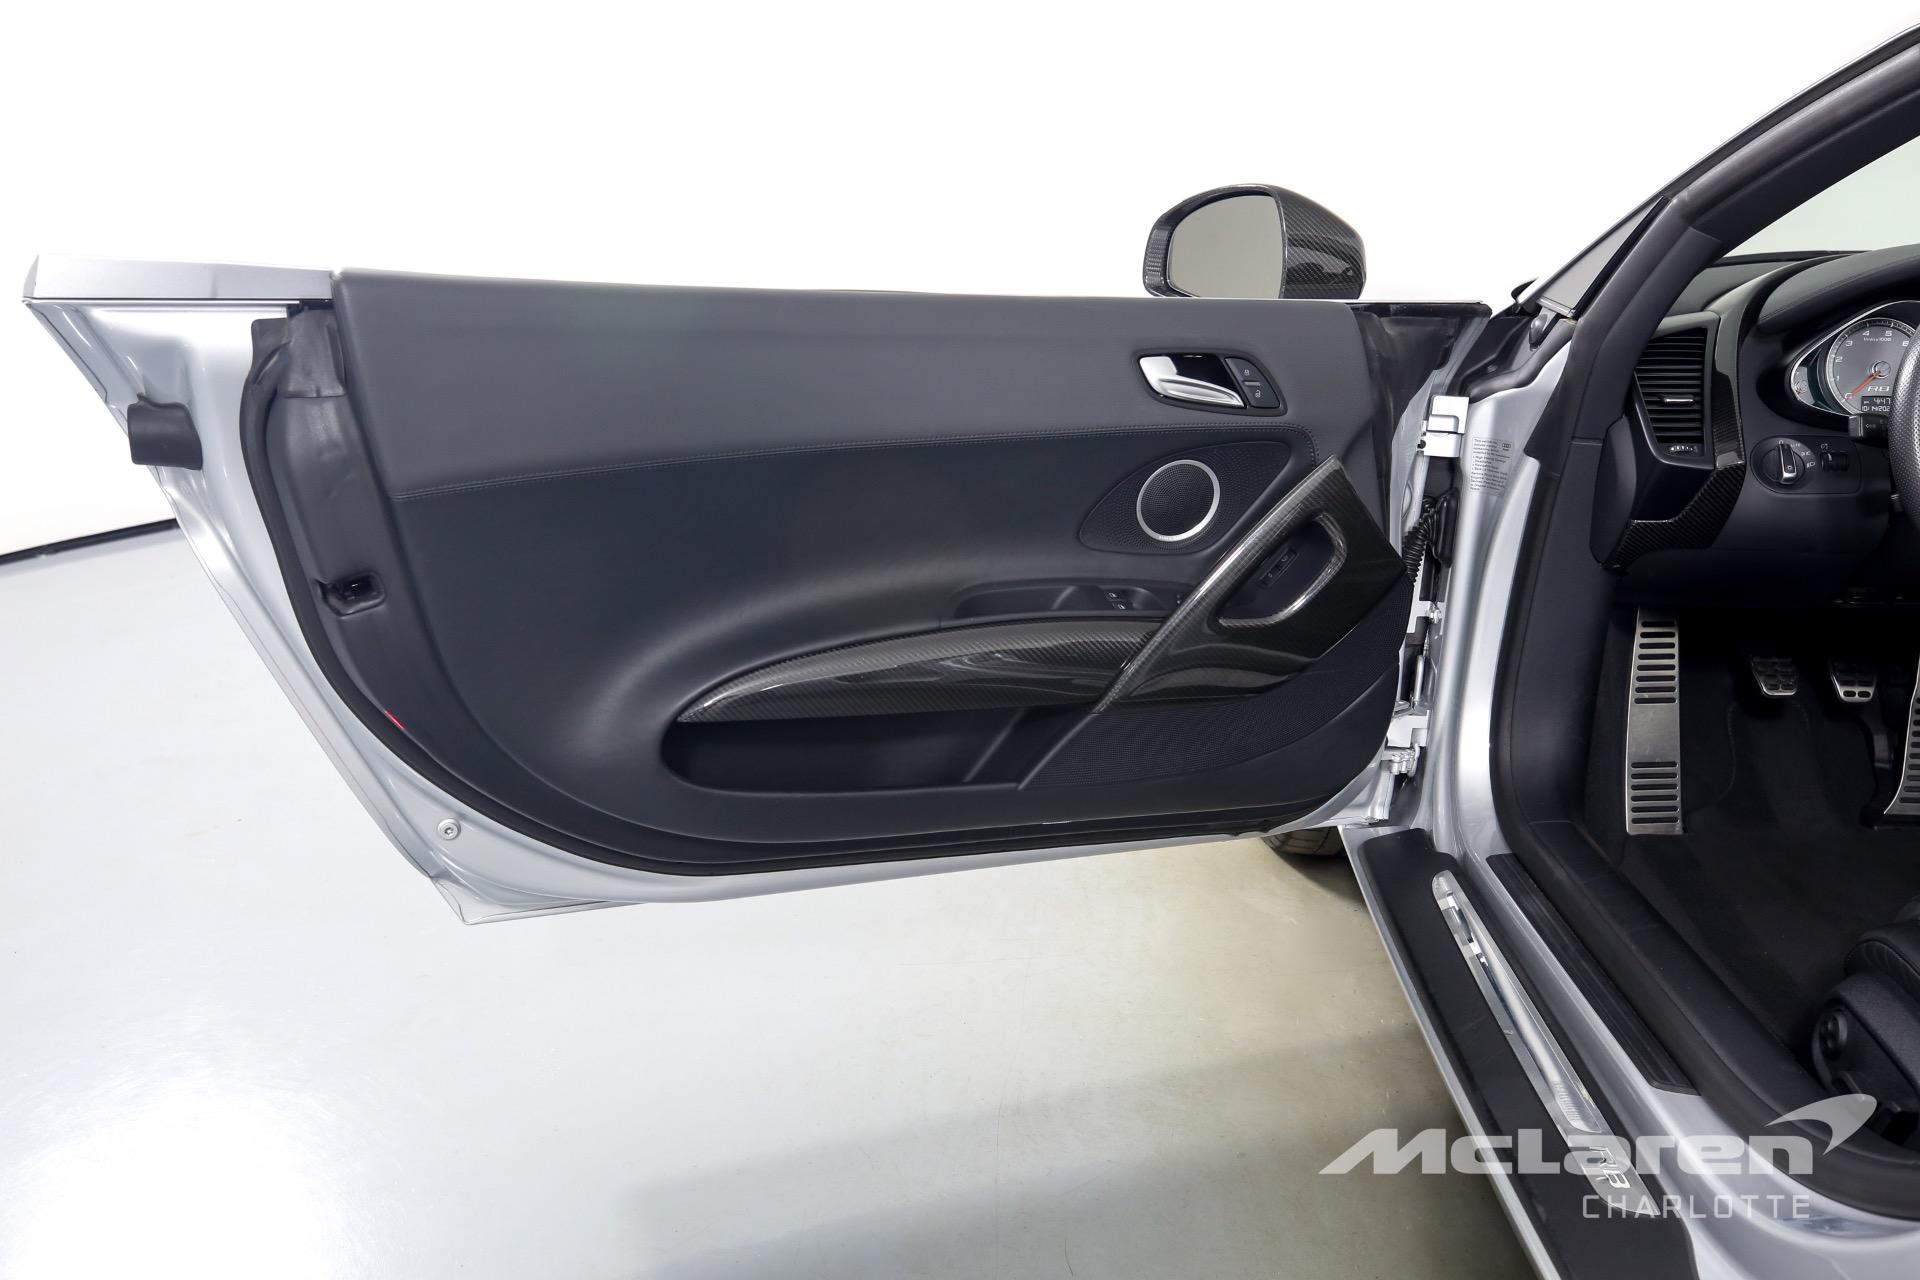 Used 2011 Audi R8 4.2 quattro Spyder   Charlotte, NC